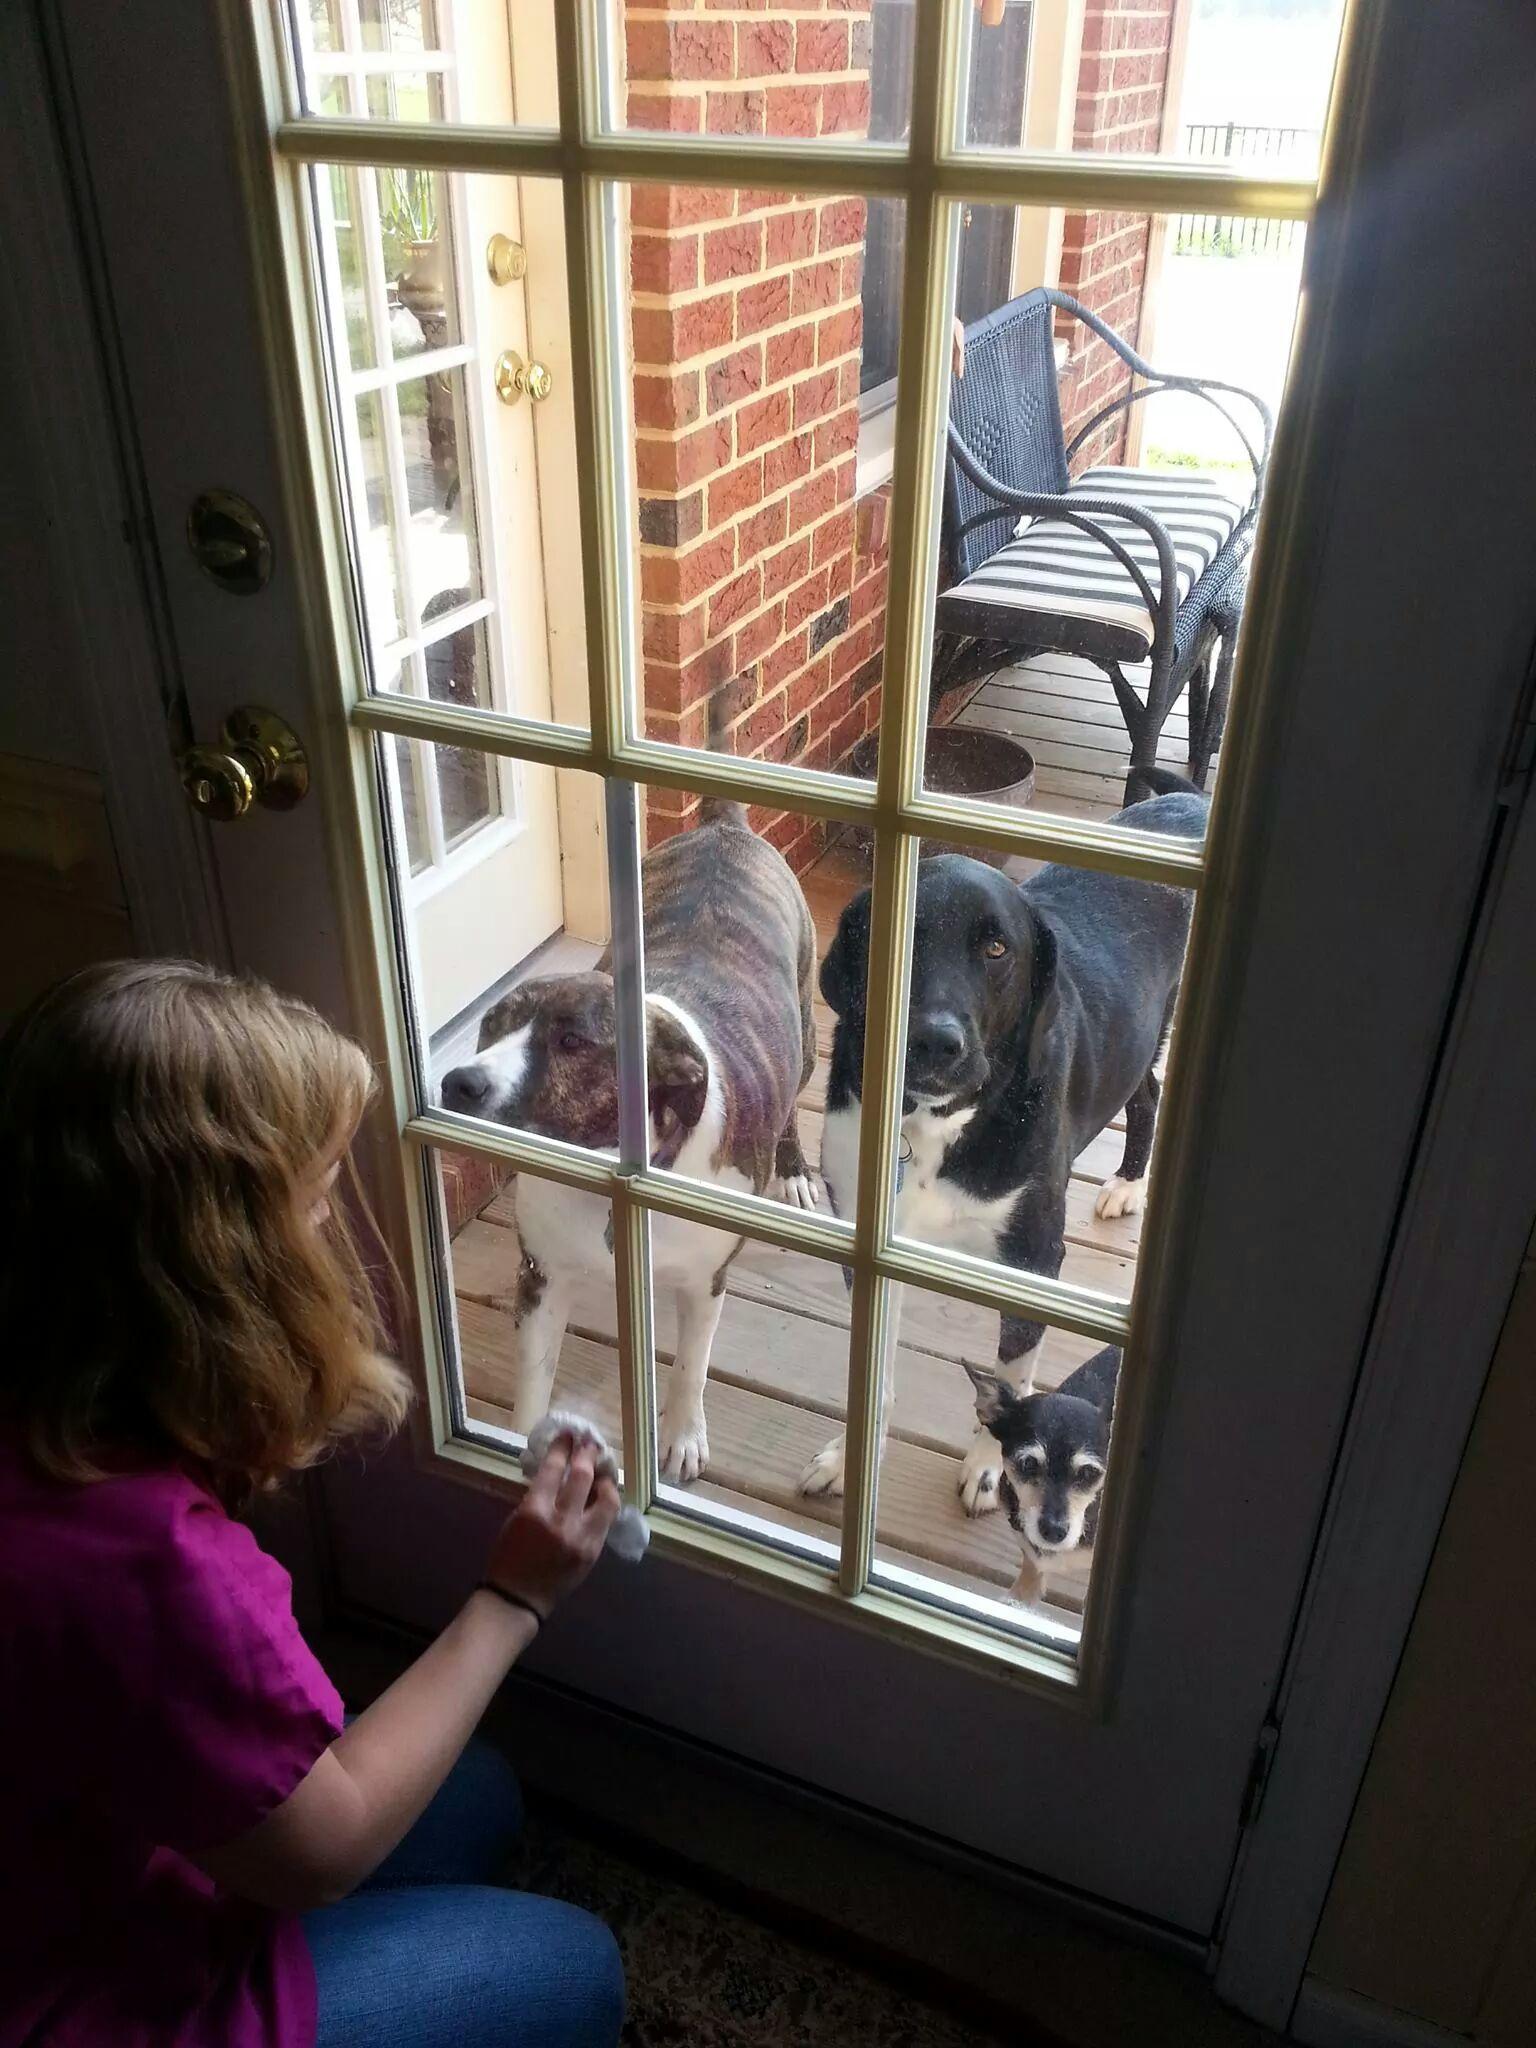 Pet friendly cleaning in hampton, newport news, williamsburg, yorktown virginia